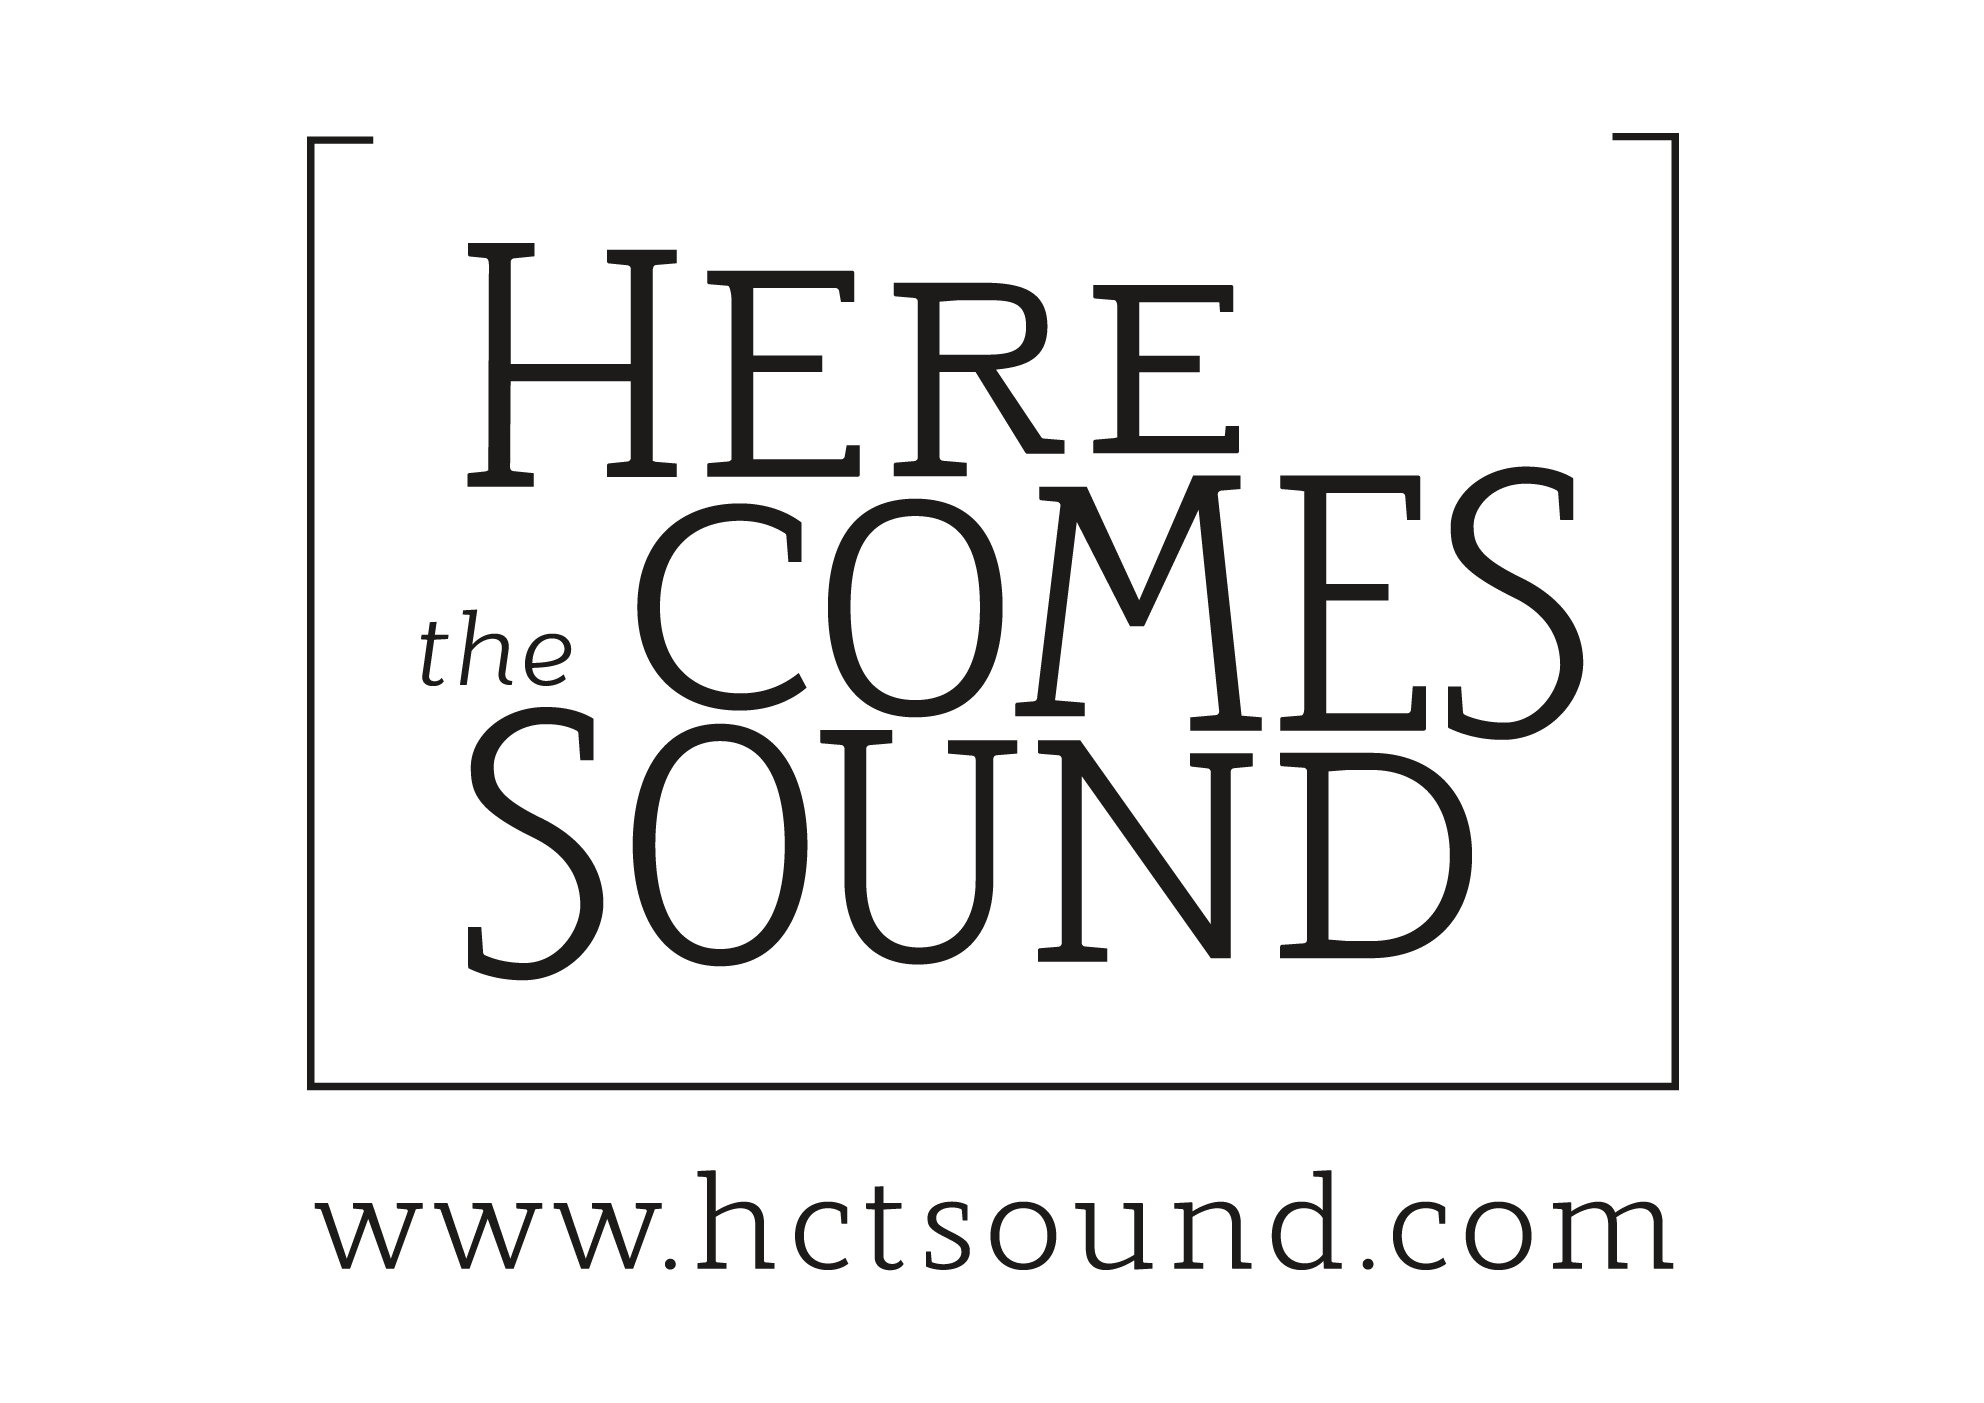 Hctsound-web_negro-transparente